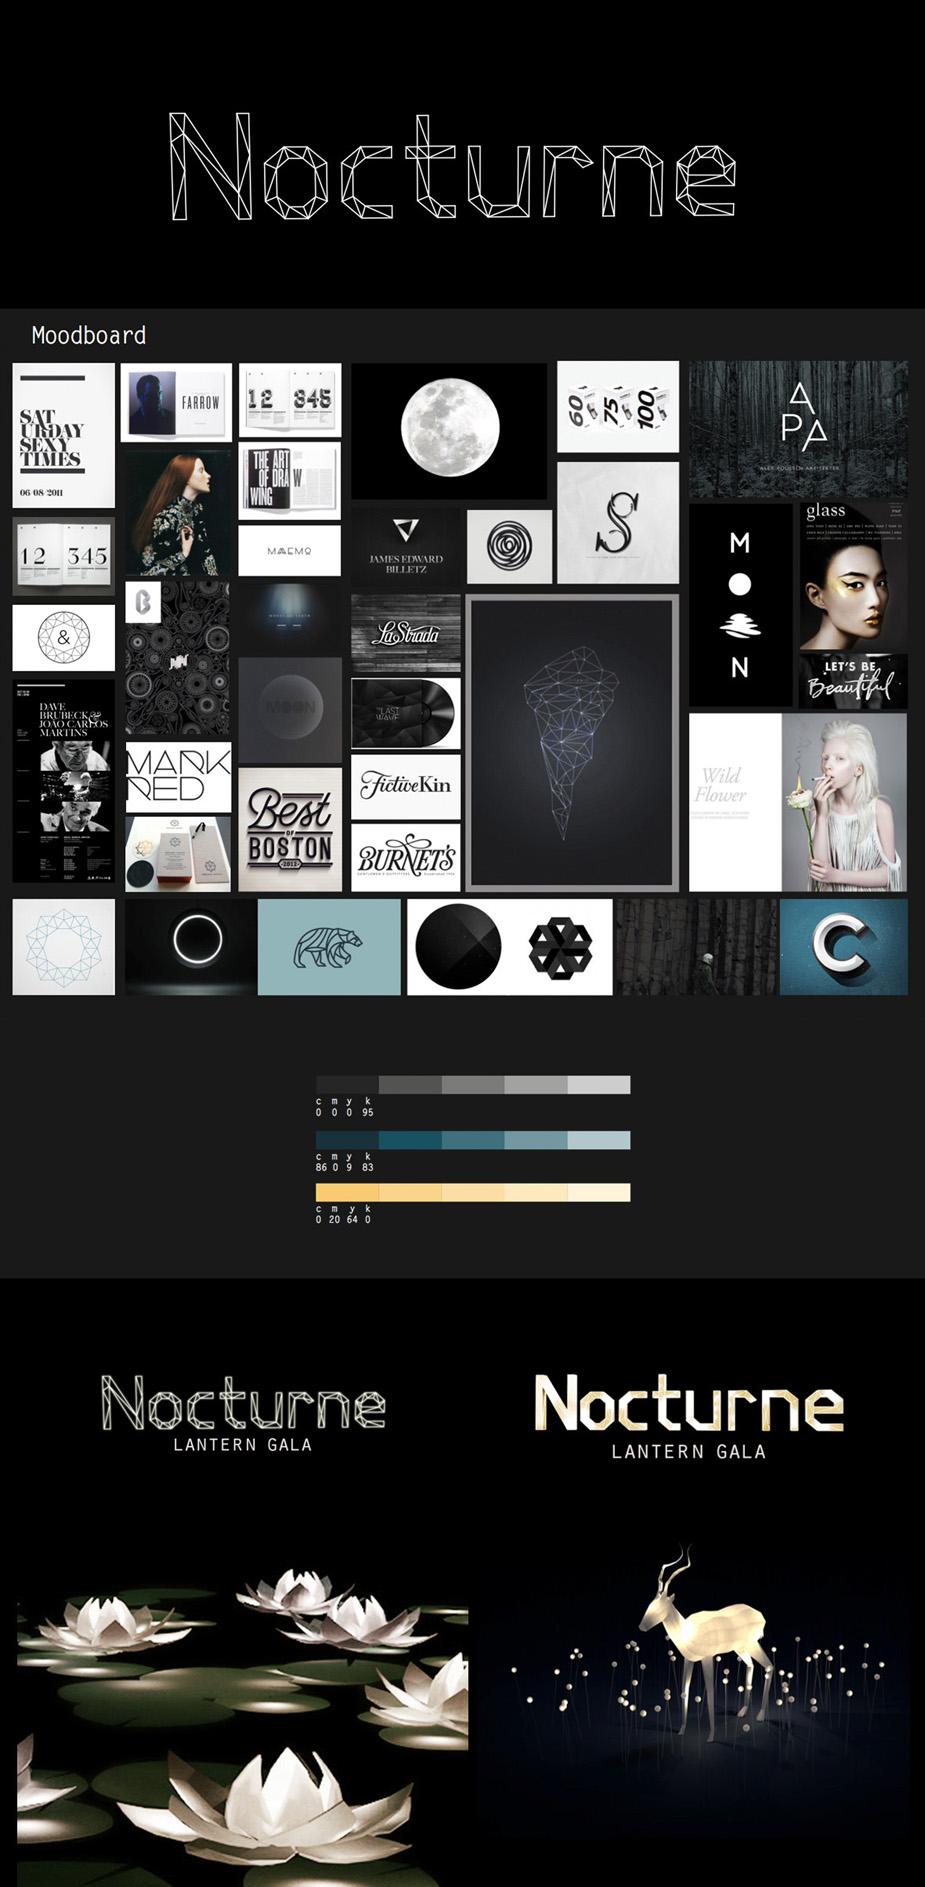 nocturne-brand